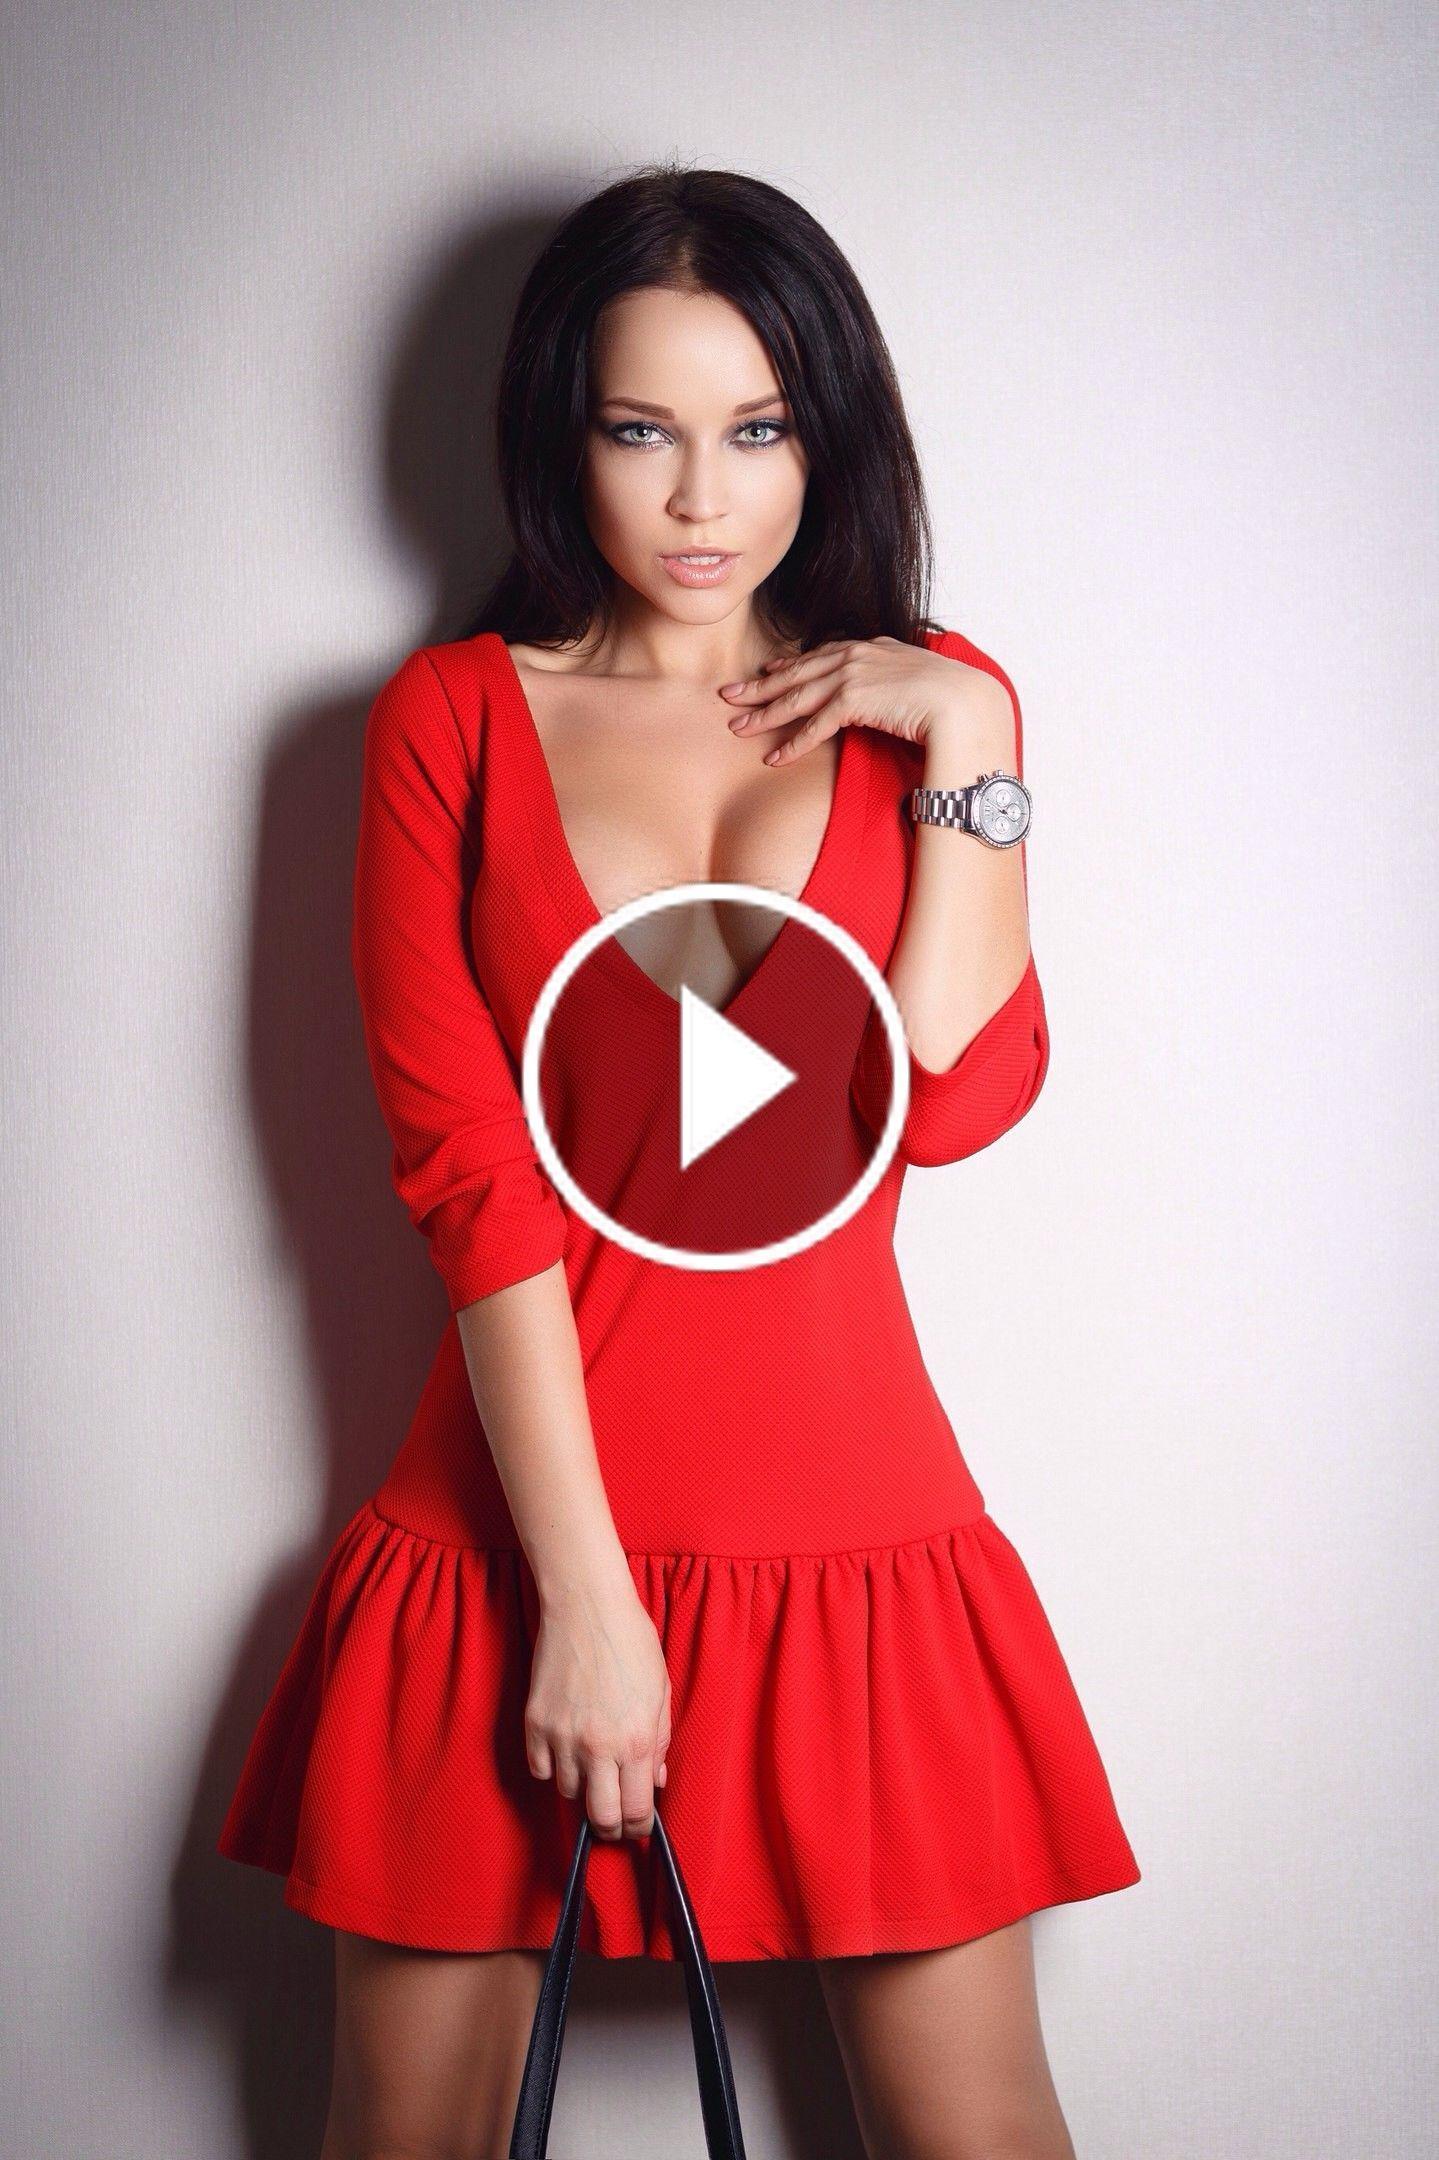 Tiffany Thompson stripping and masturbating